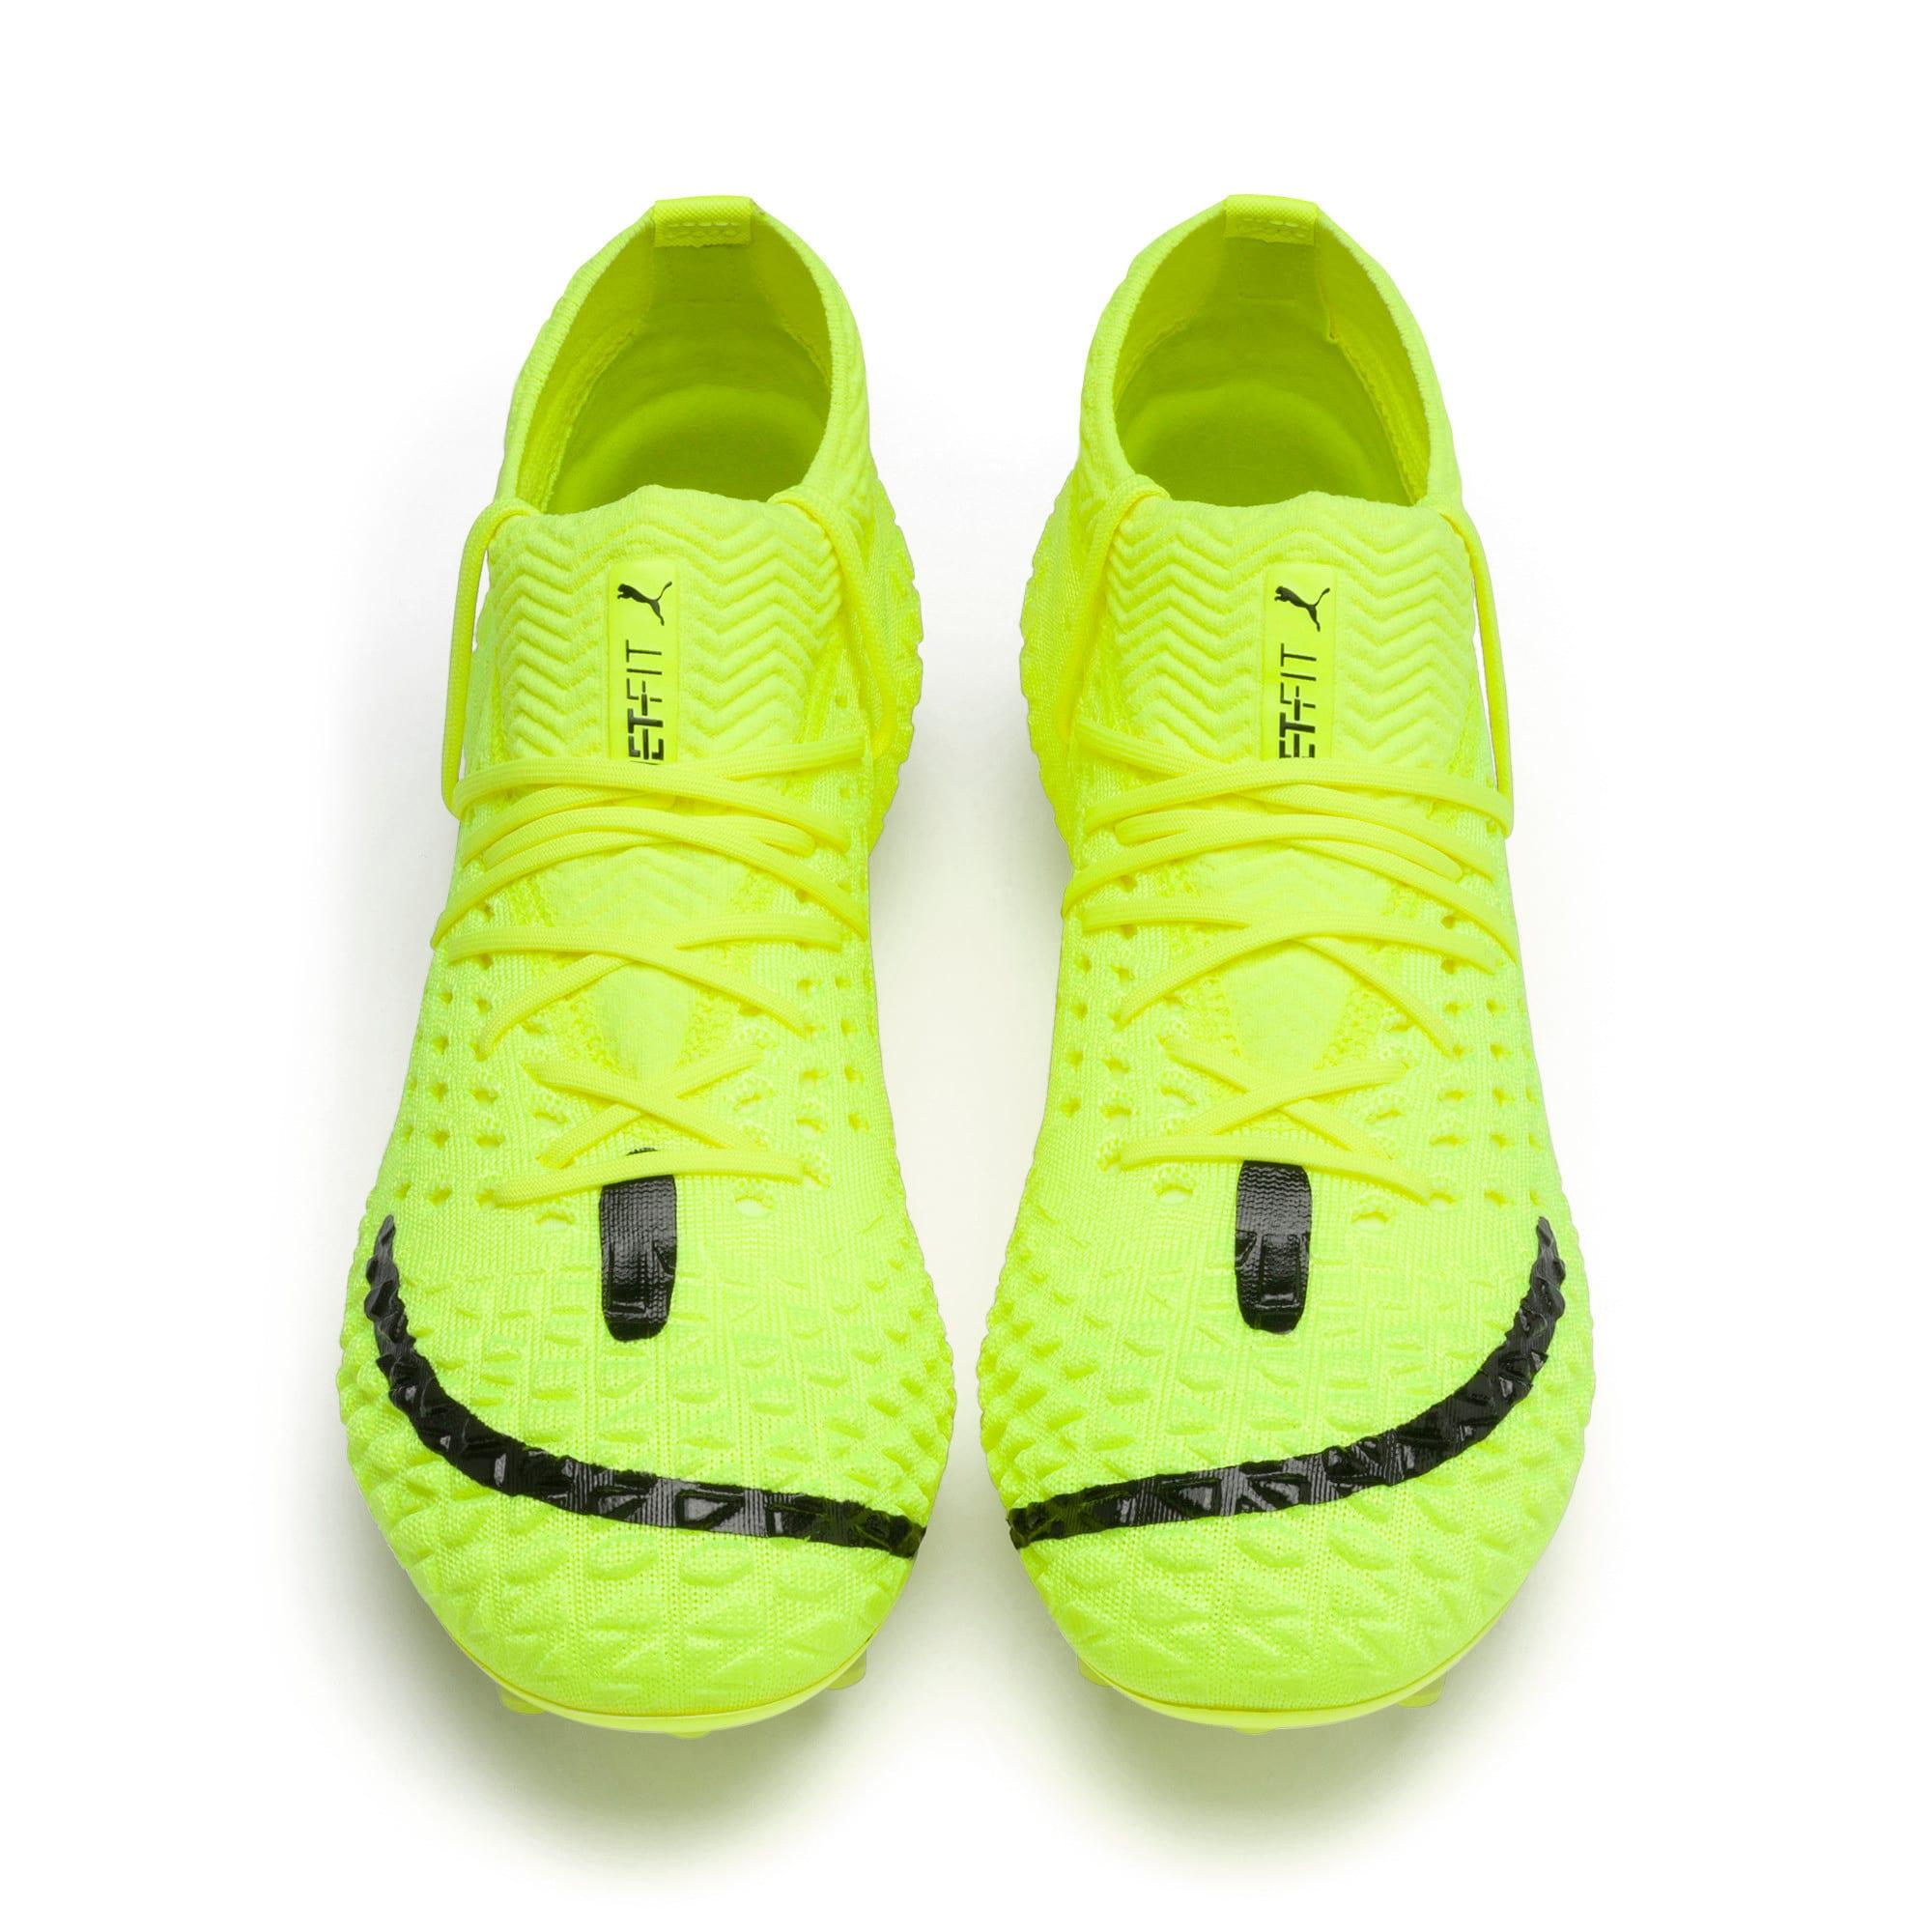 Thumbnail 2 of FUTURE 4.1 NETFIT Griezmann FG/AG Men's Football Boots, Yellow Alert-Puma Black, medium